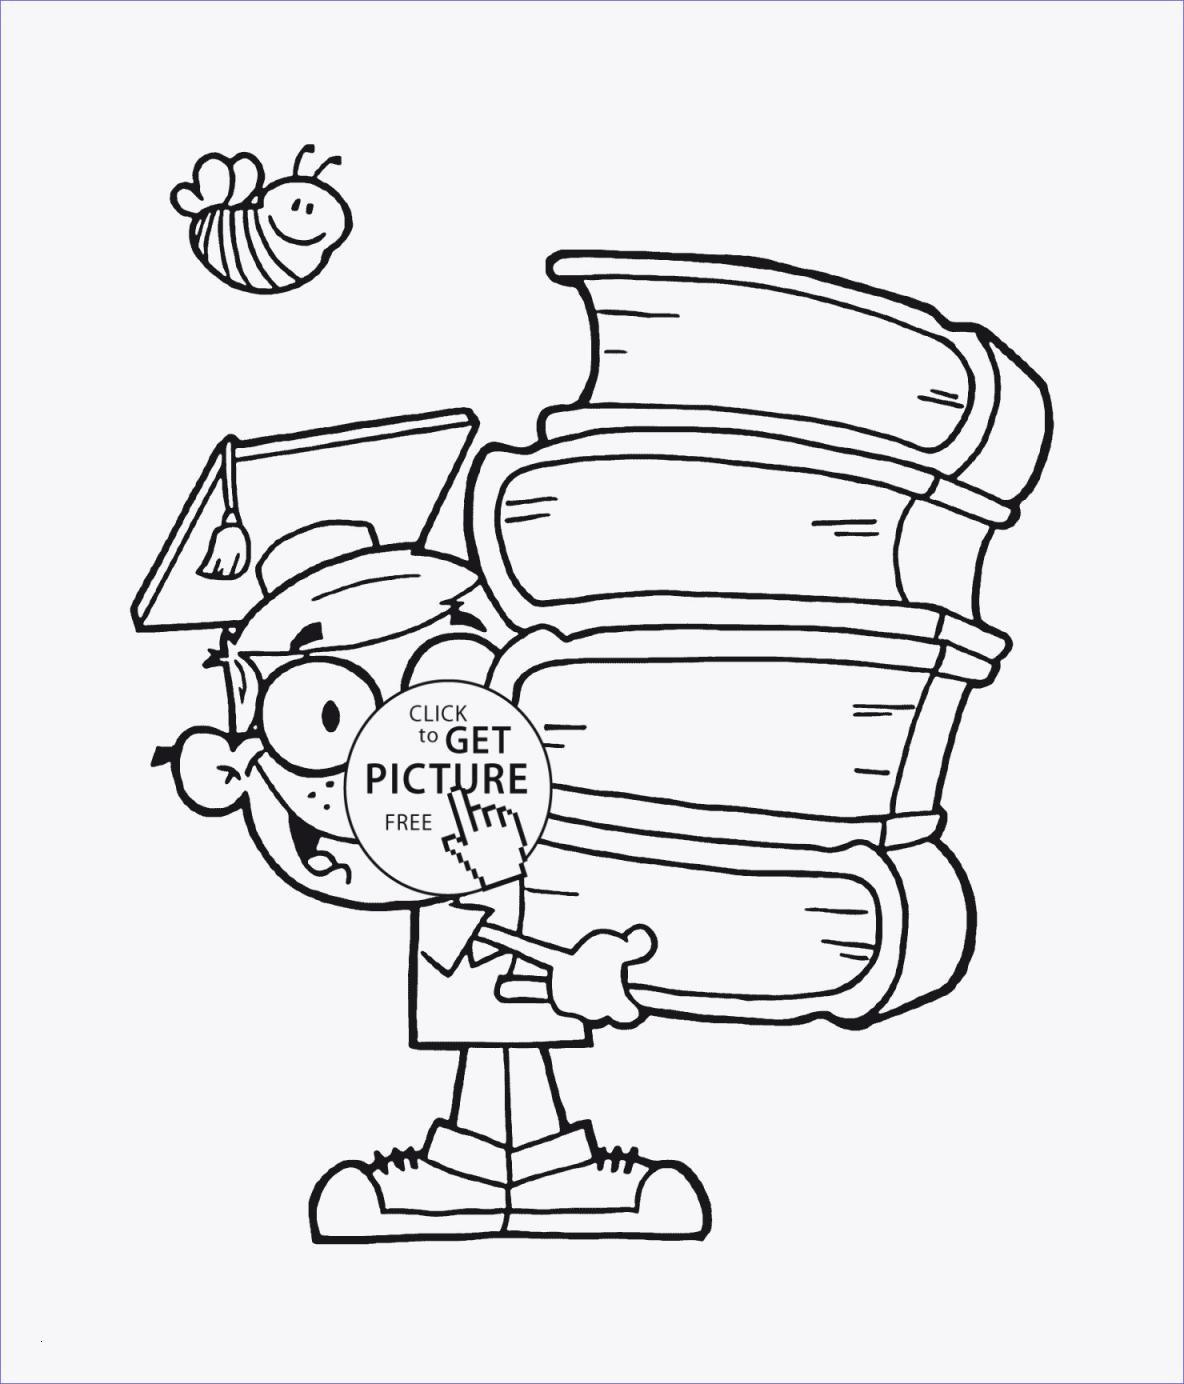 Ninjago Jay Ausmalbild Inspirierend Malvorlagen Igel Frisch Igel Grundschule 0d Archives Uploadertalk Bild